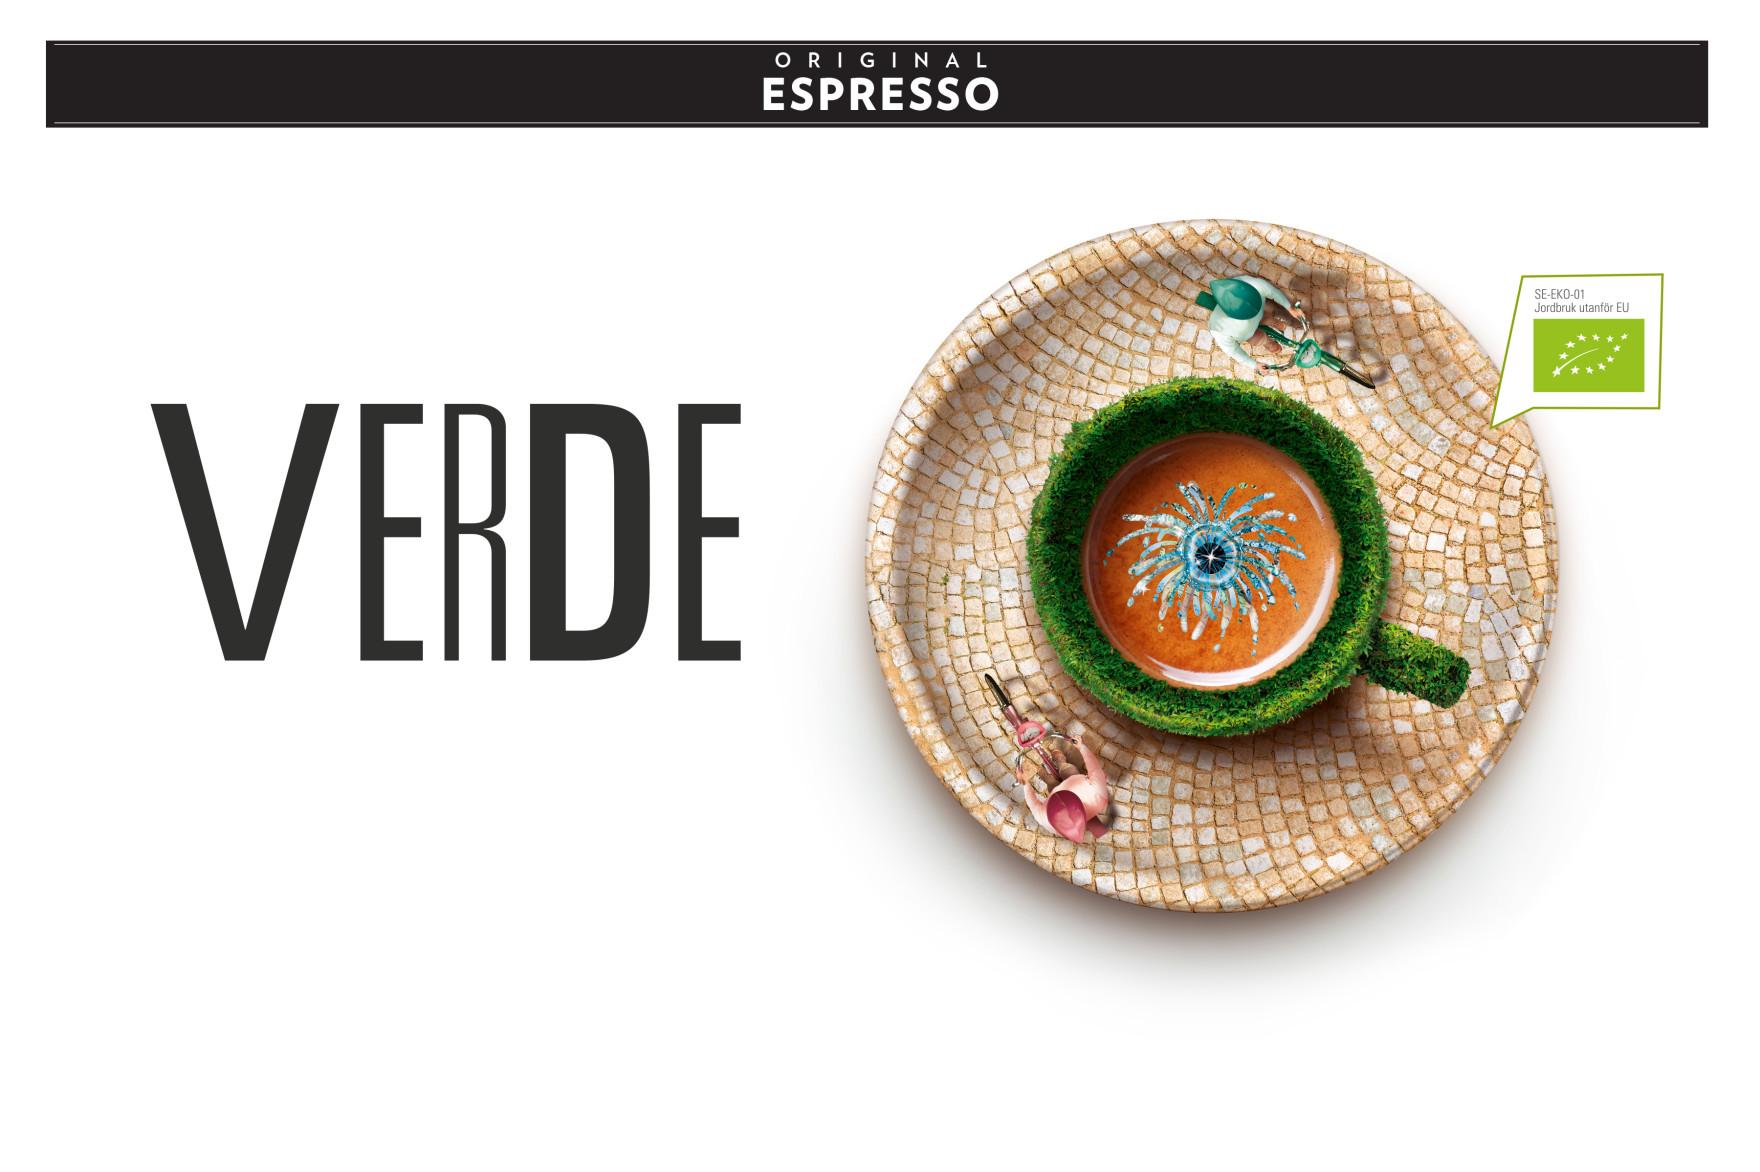 Espresso-Verde-Organic-coffee-beans